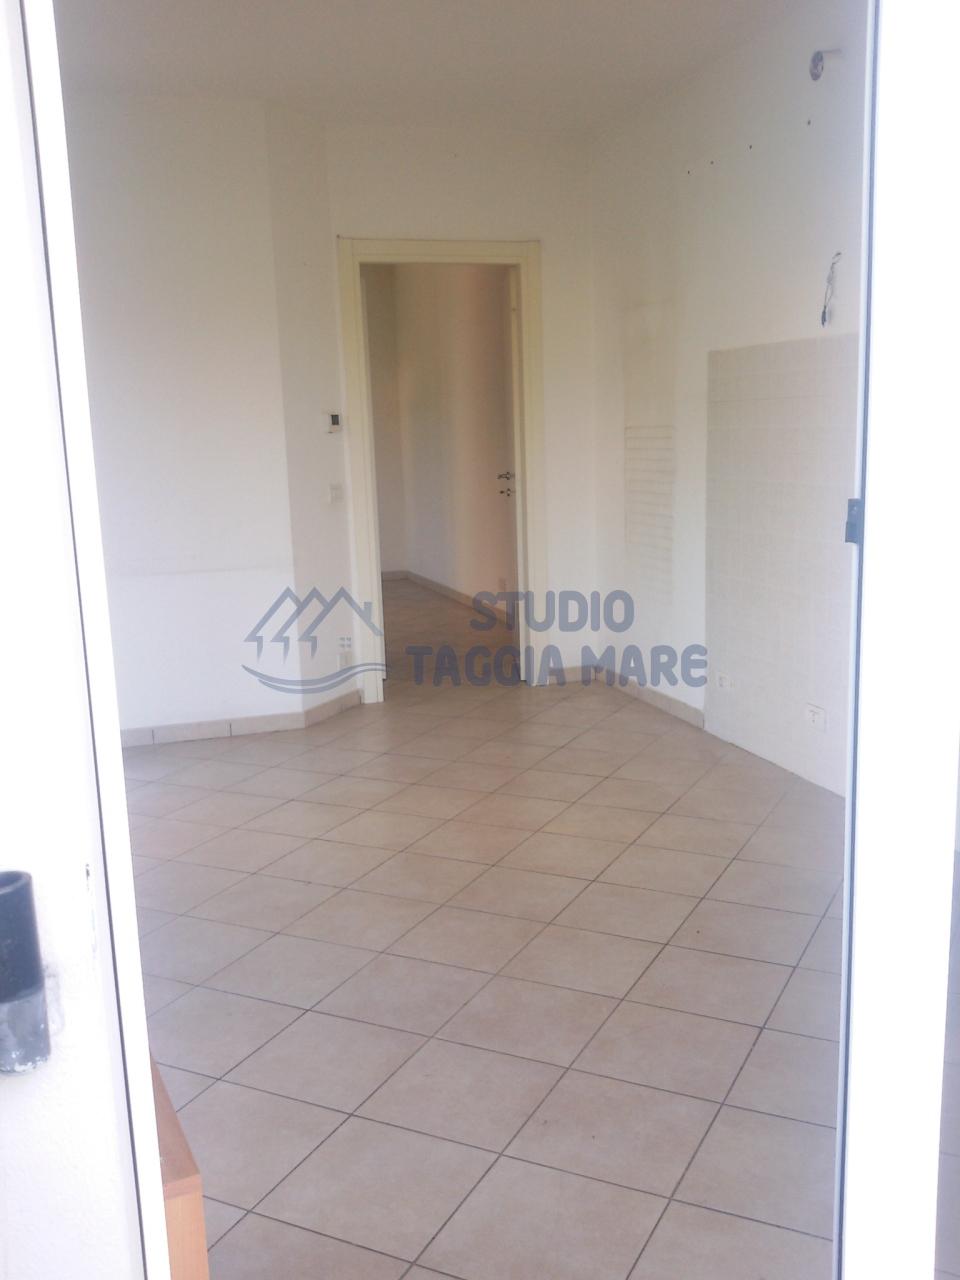 Bilocale Taggia Via San Francesco 453 12